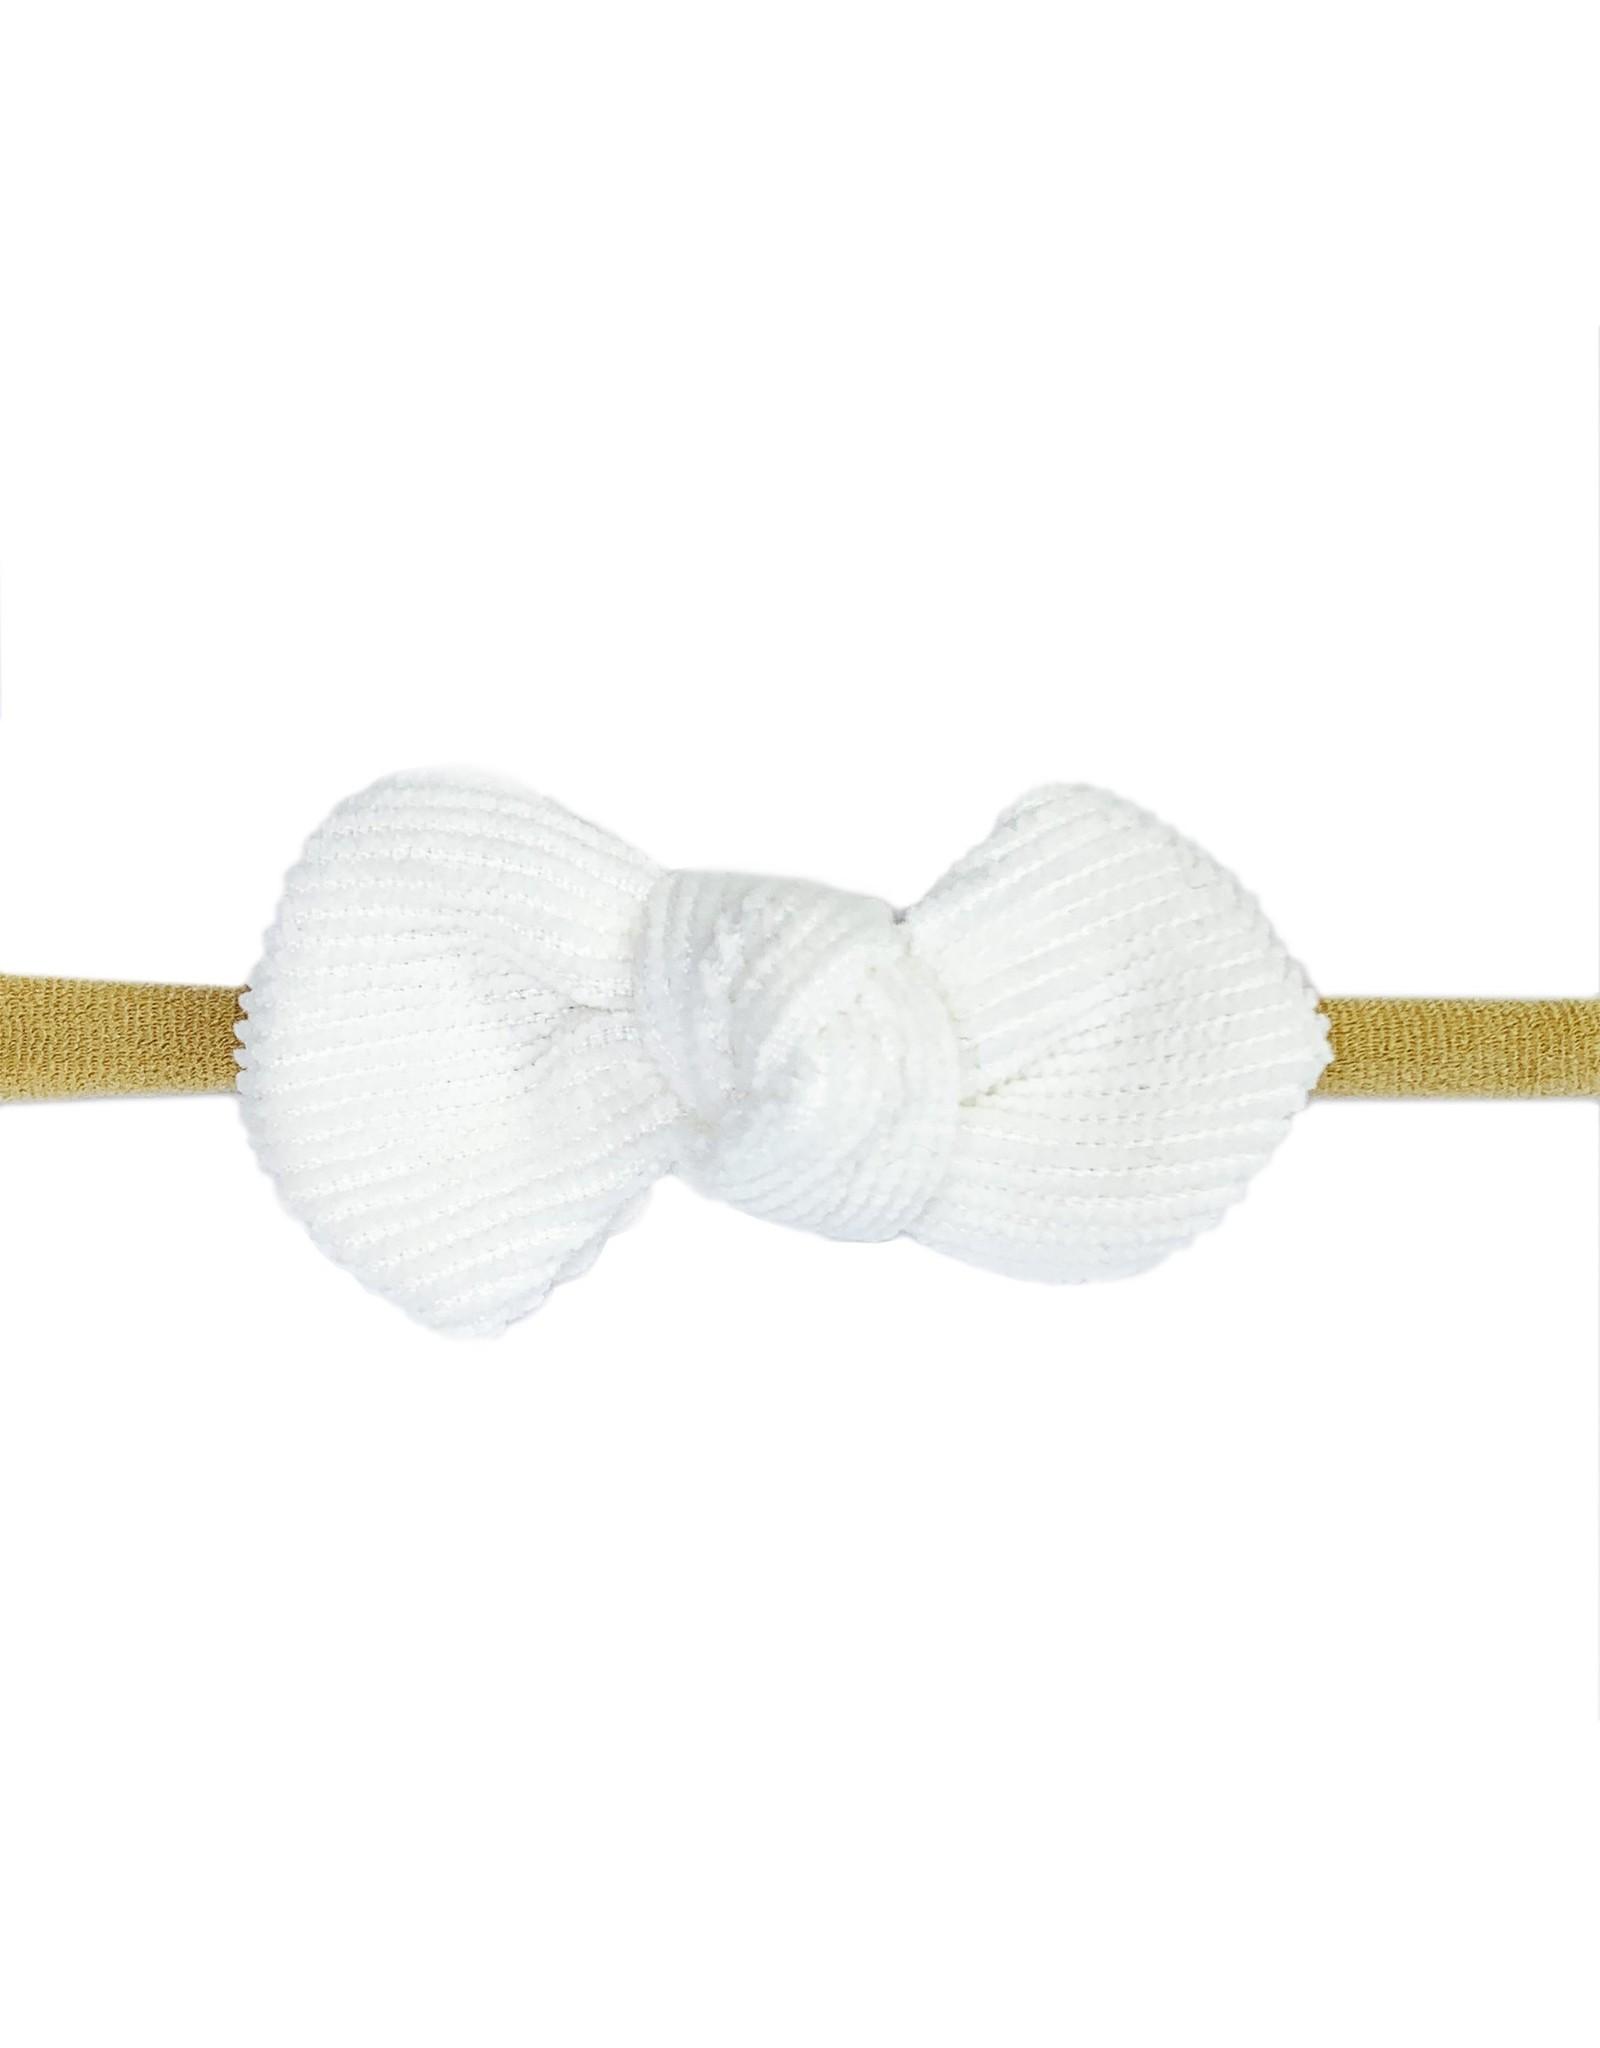 Baby Wisp Babywisp Headband Corduroy Knot, White